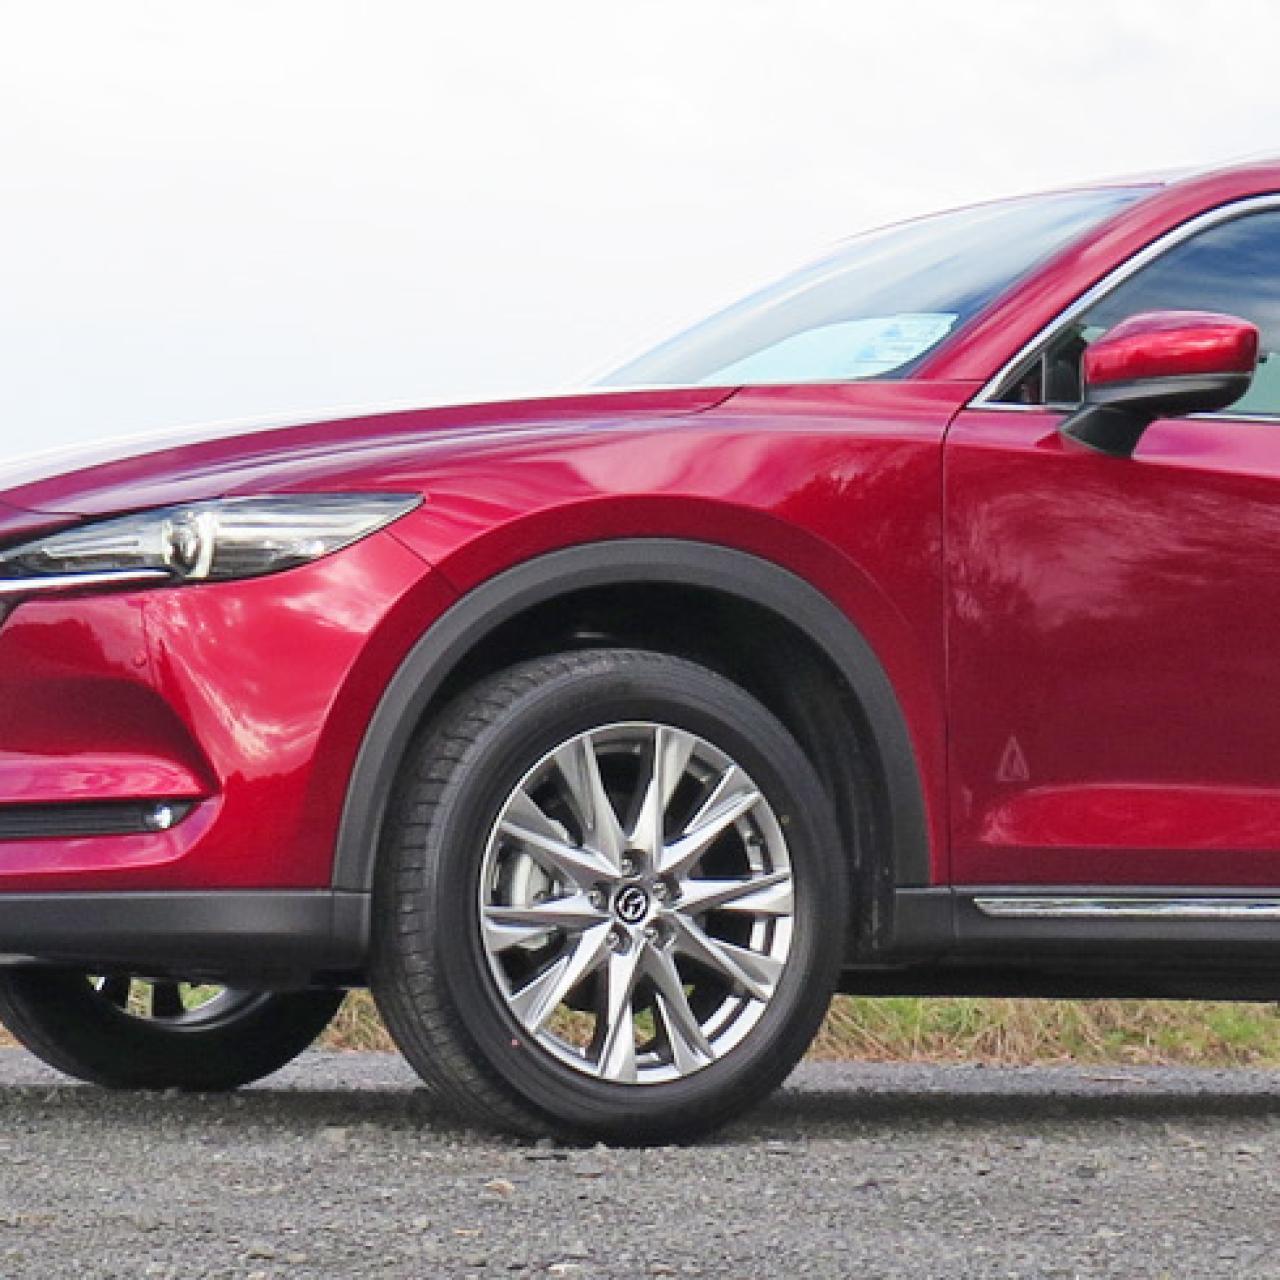 Mazda add the CX-8 to their award winning SUV lineup